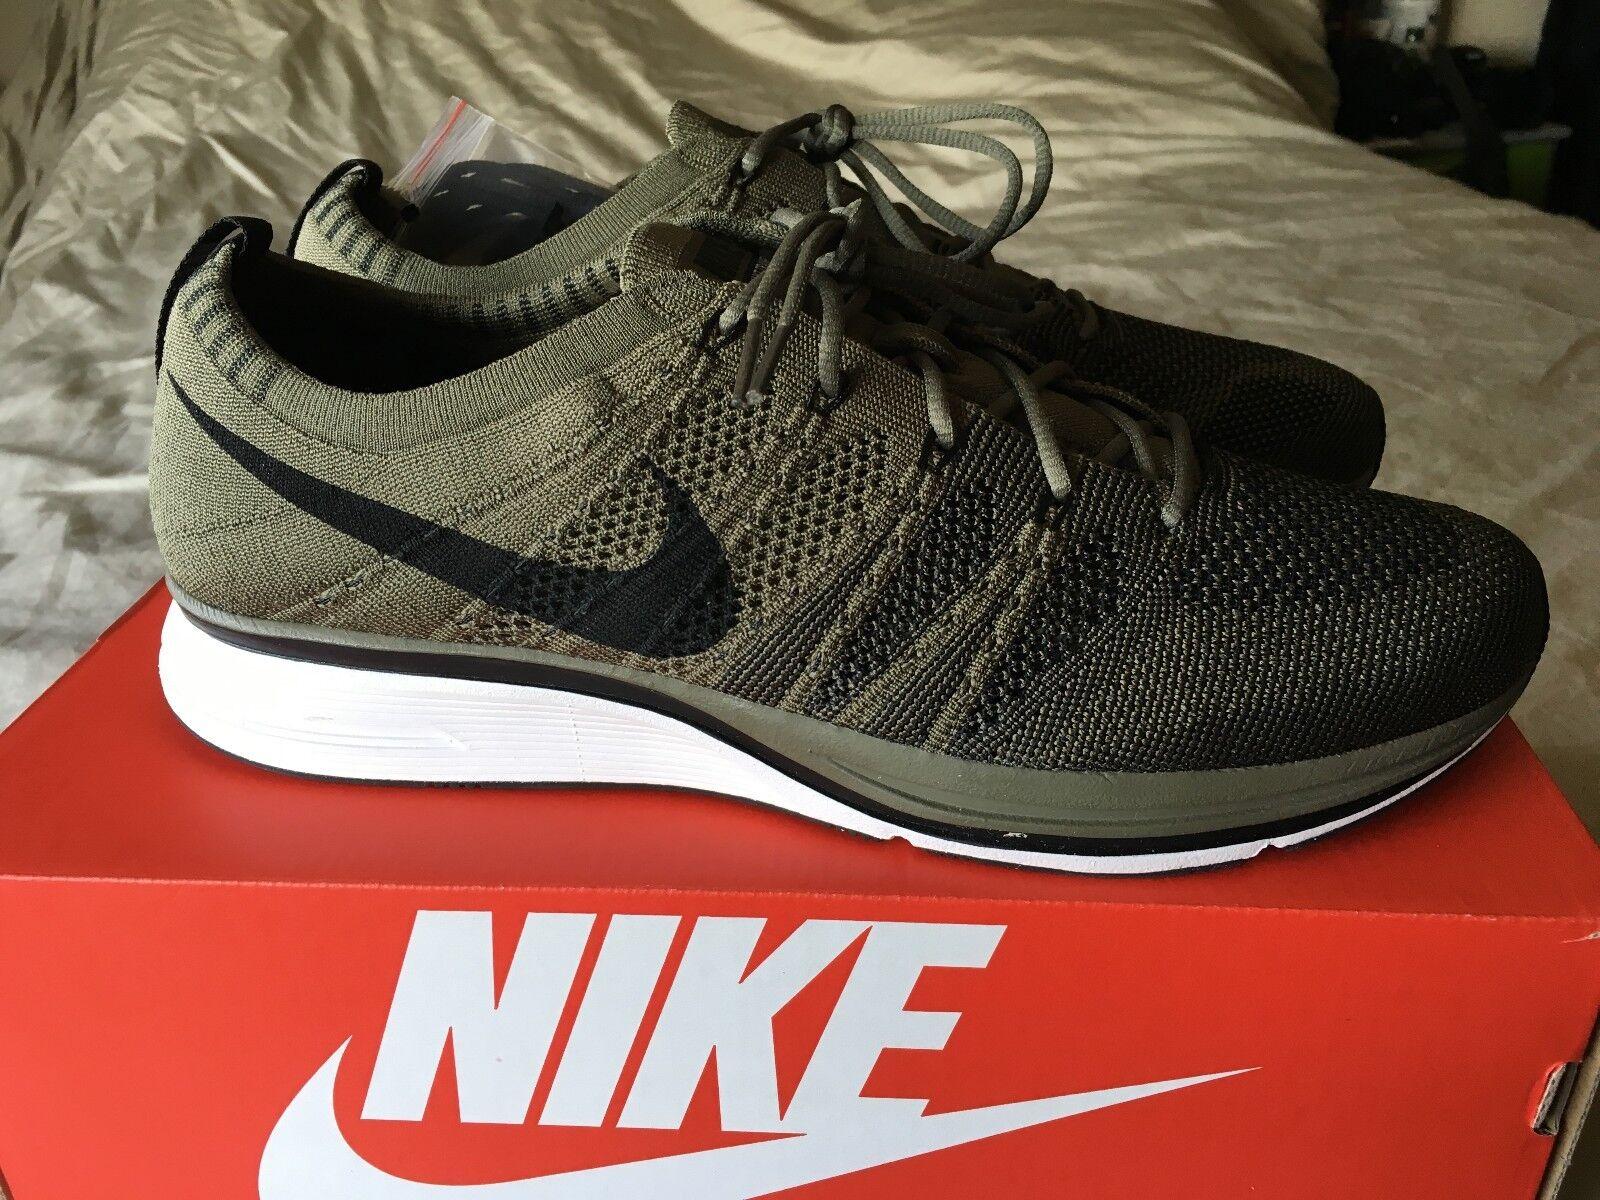 Nike Flyknit Trainer Running Medium Olive/Black/White AH8396-200 Mens 11 SZ 11 Mens 2ff0b6